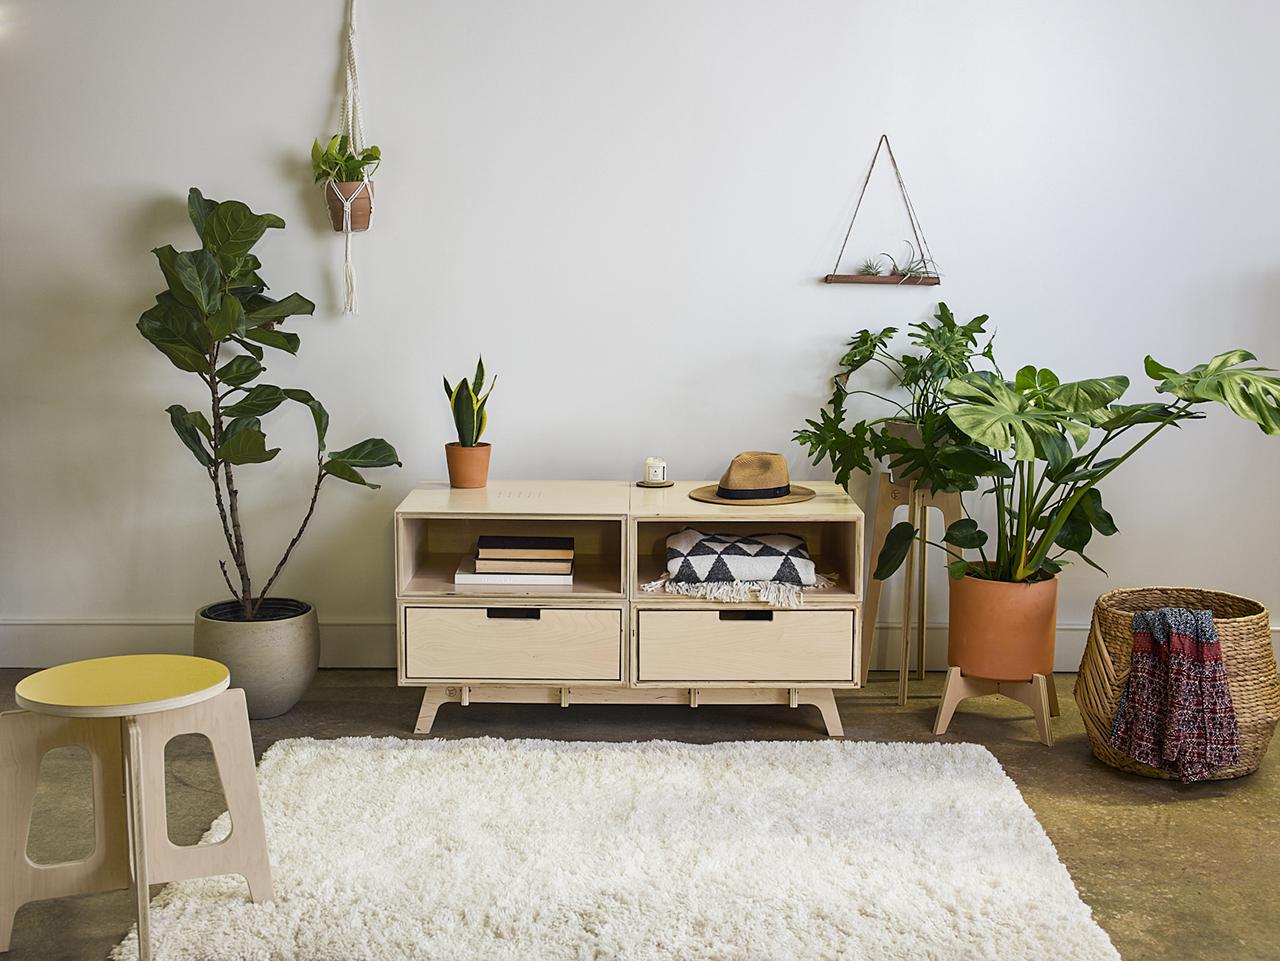 Flitch Furniture Makes Modular Furniture for Customizable Storage - Design Milk